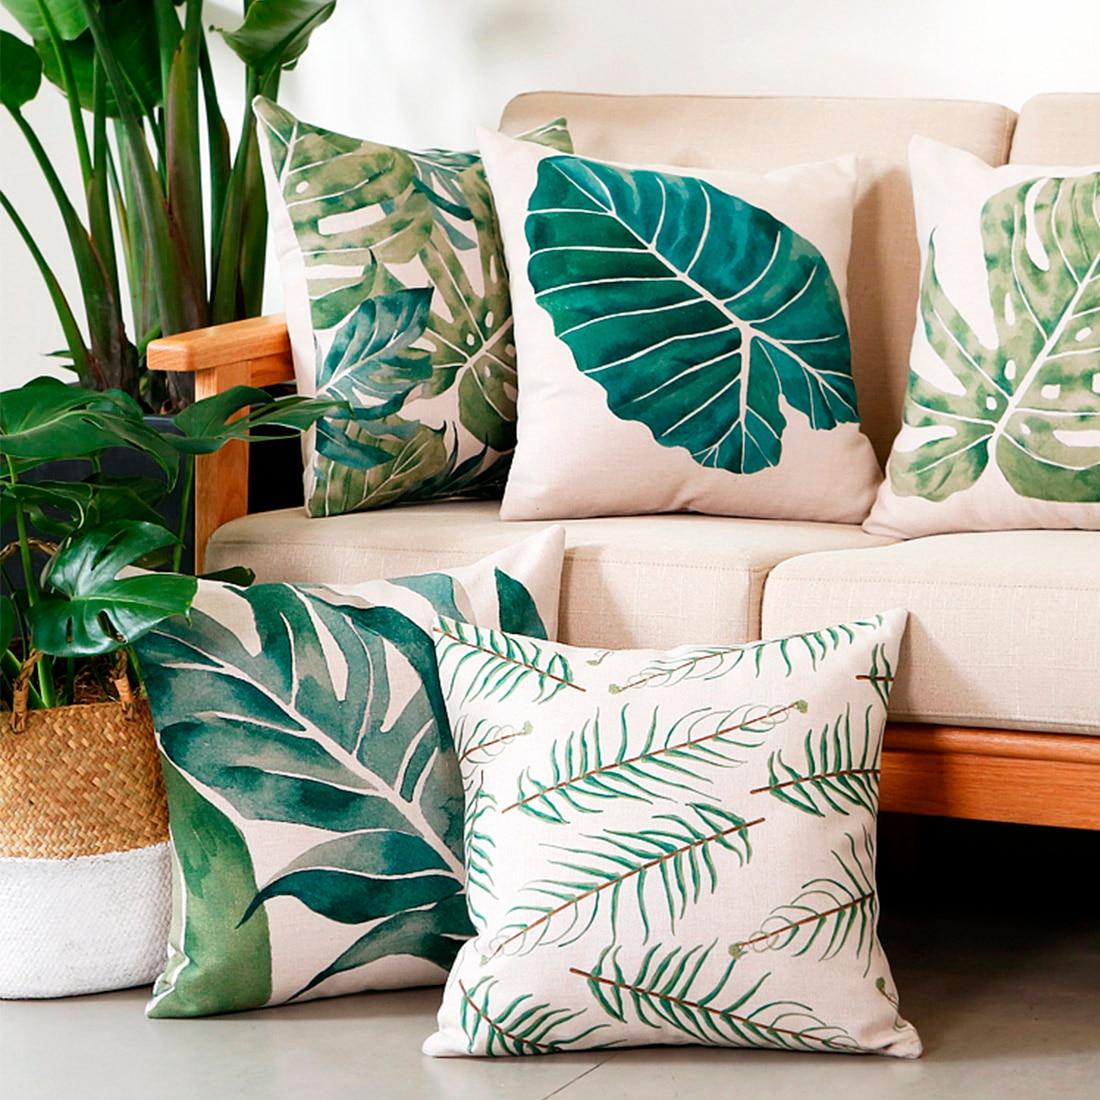 45x45cm Simple Car Home Decor Pillow Case Tropical Plants Green Leaves Cushion Sofa Cover Throw Pillow in Cushion Cover from Home Garden